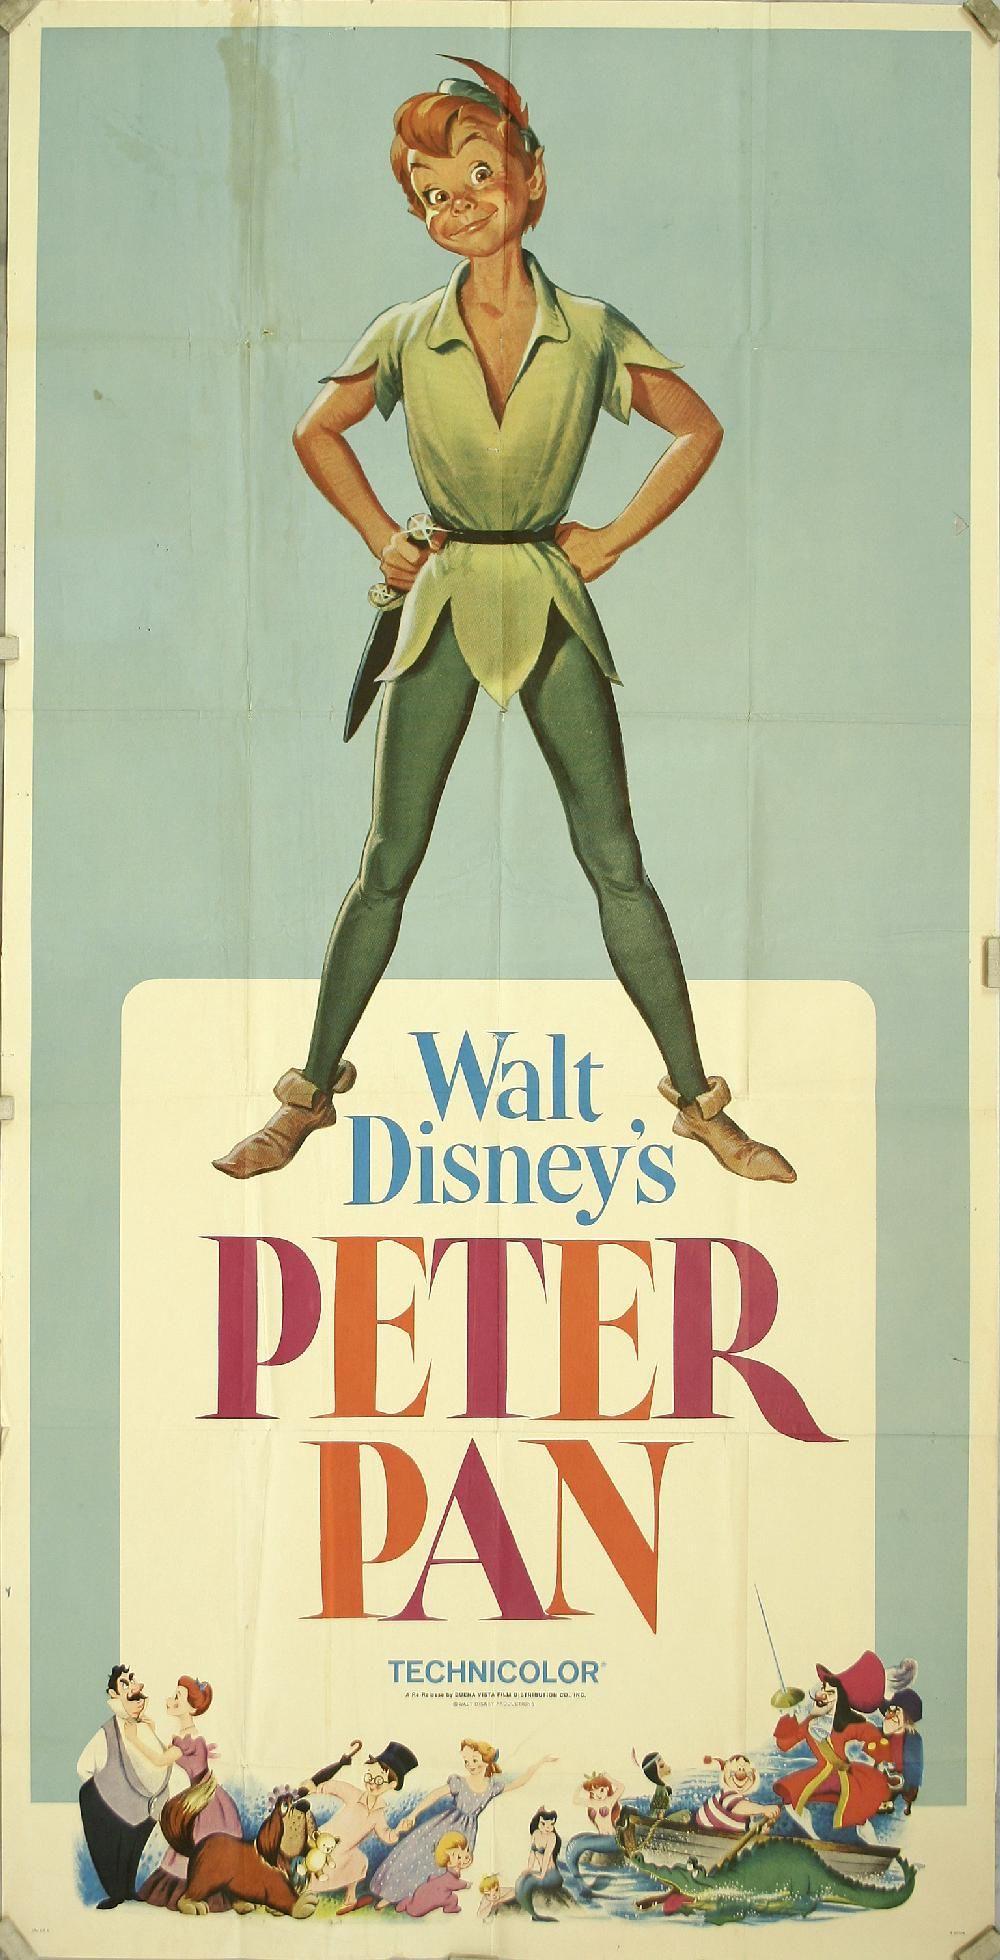 PETER PAN 1953 FILM POSTER A3 REPRINT